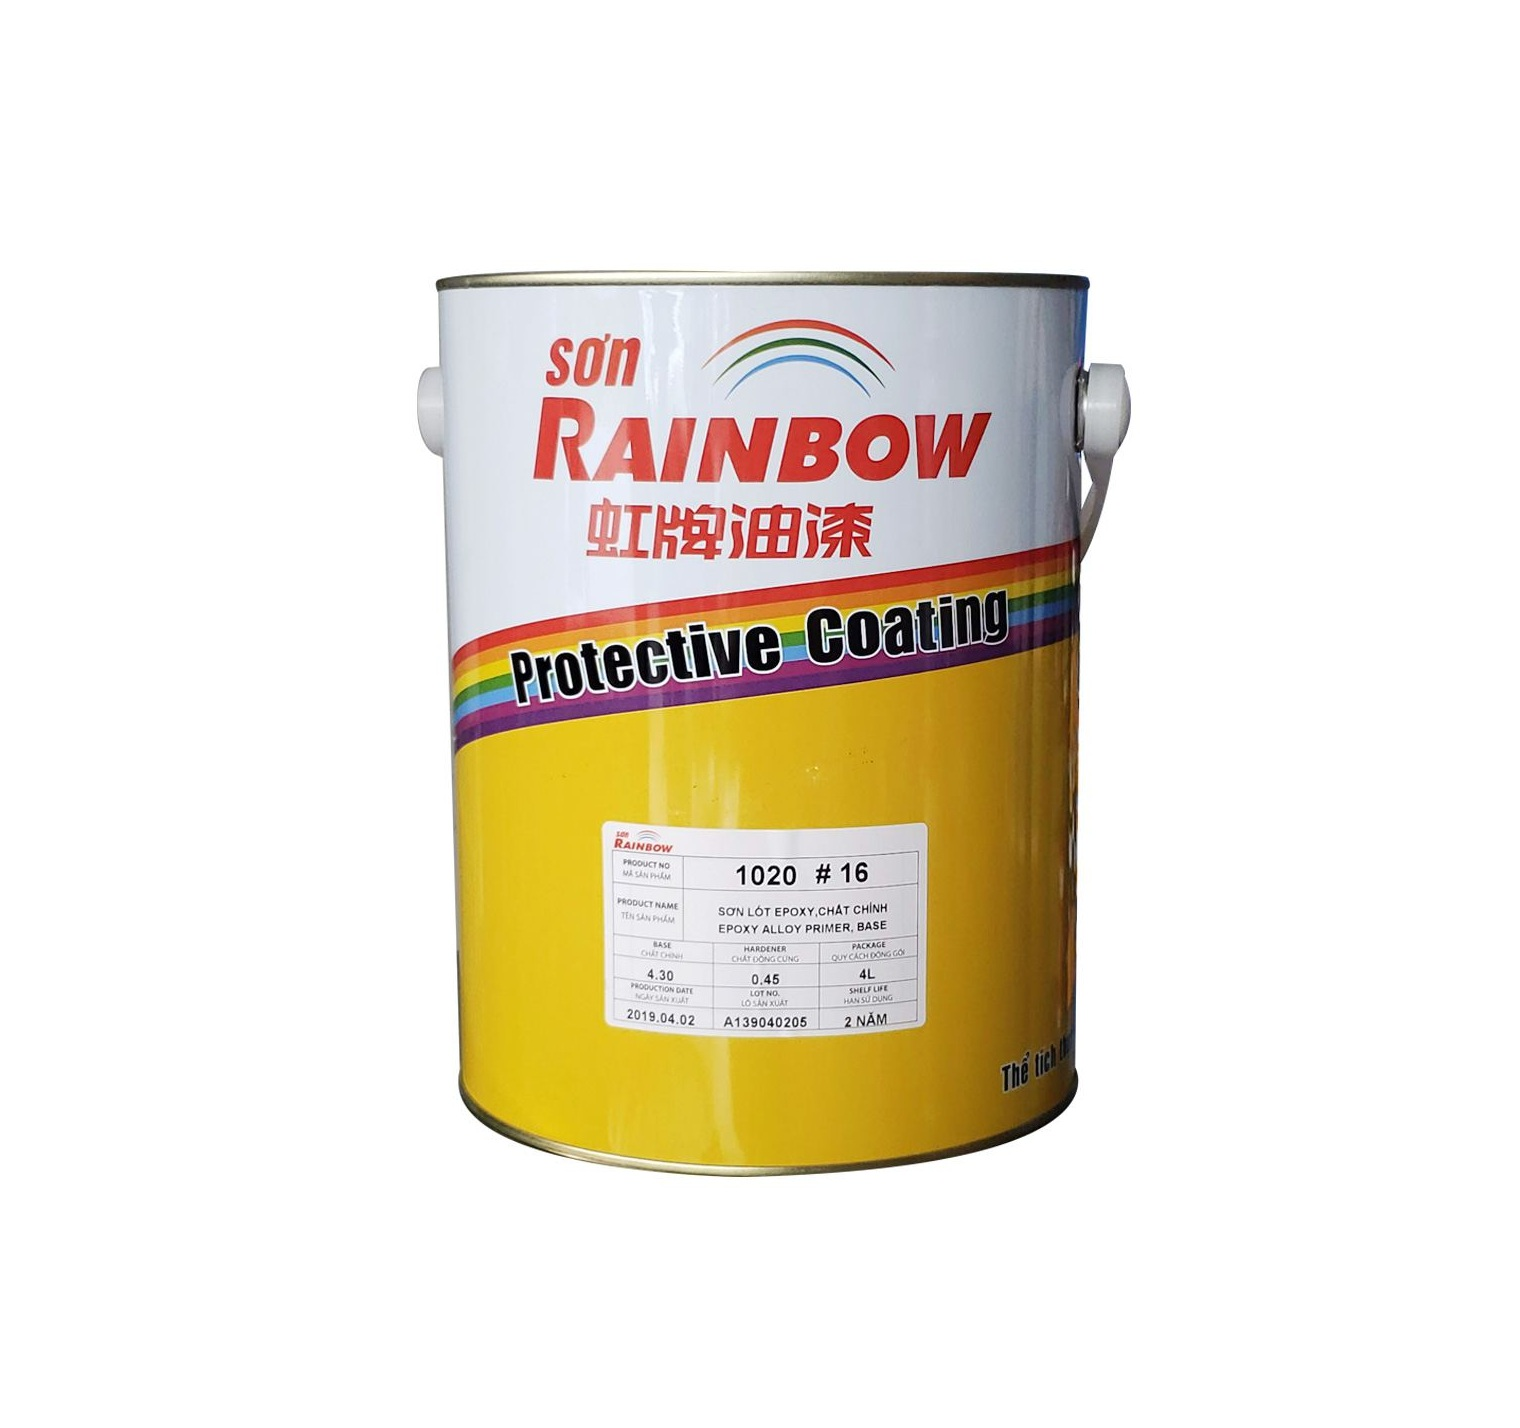 Sơn kẻ vạch rainbow